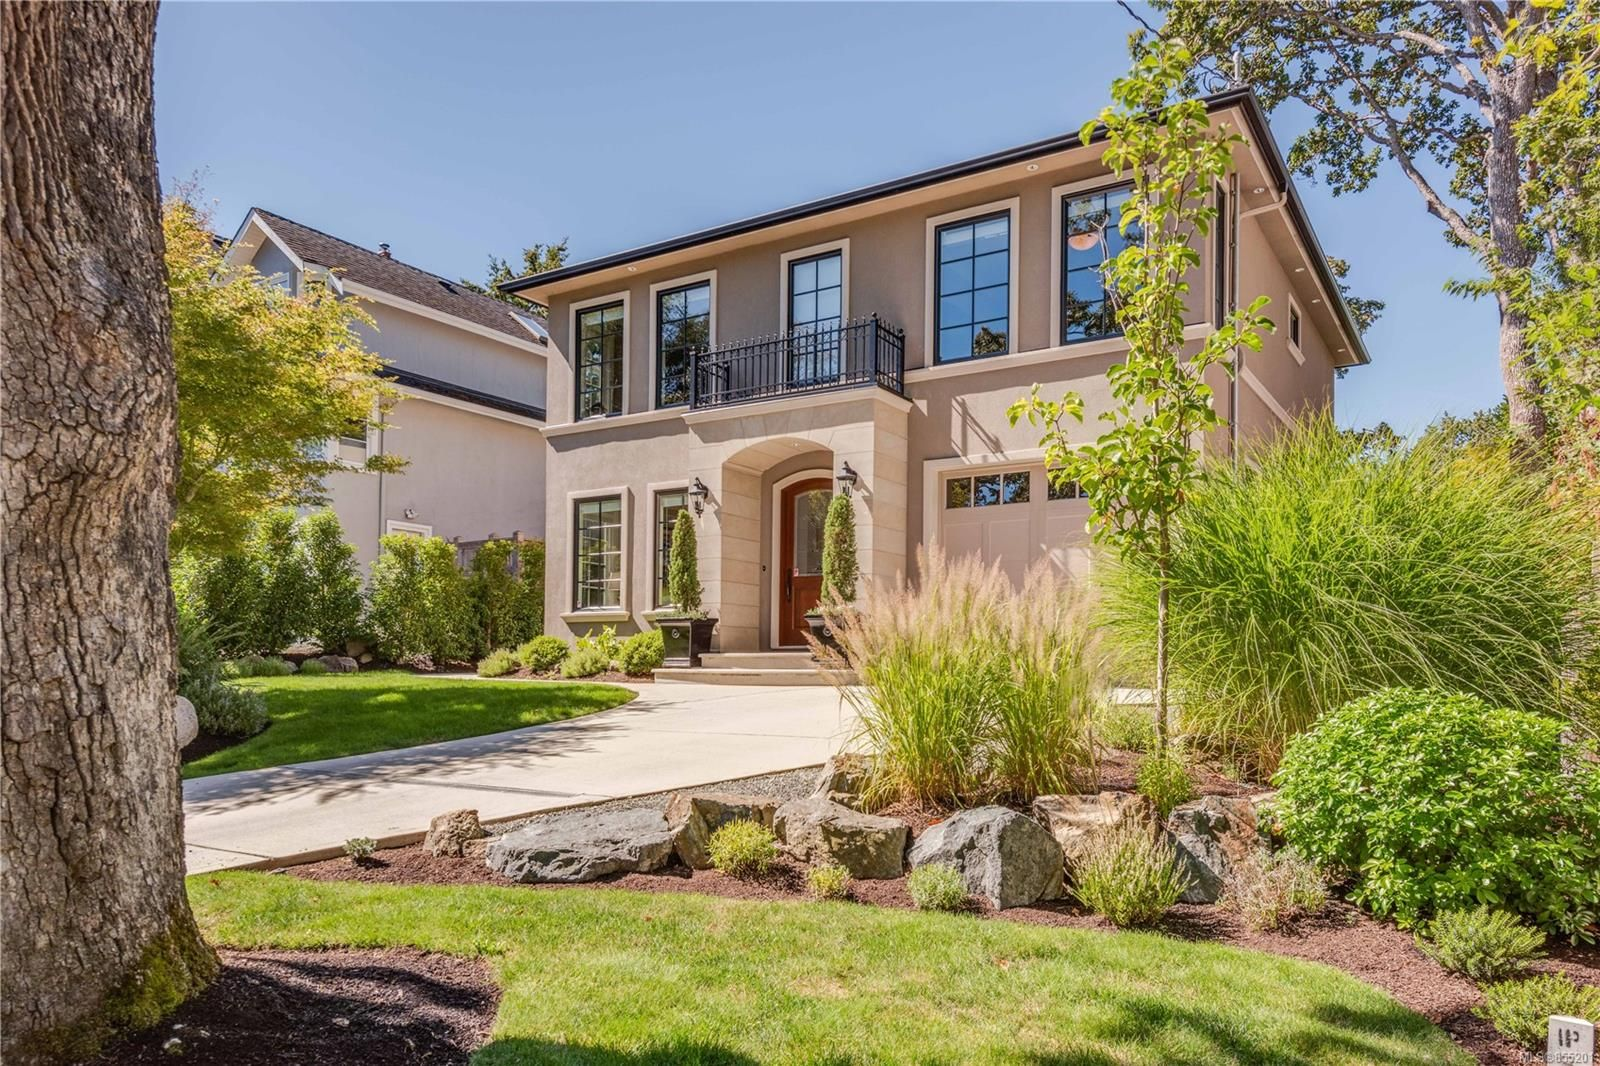 Main Photo: 1242 Oliver St in : OB South Oak Bay House for sale (Oak Bay)  : MLS®# 855201